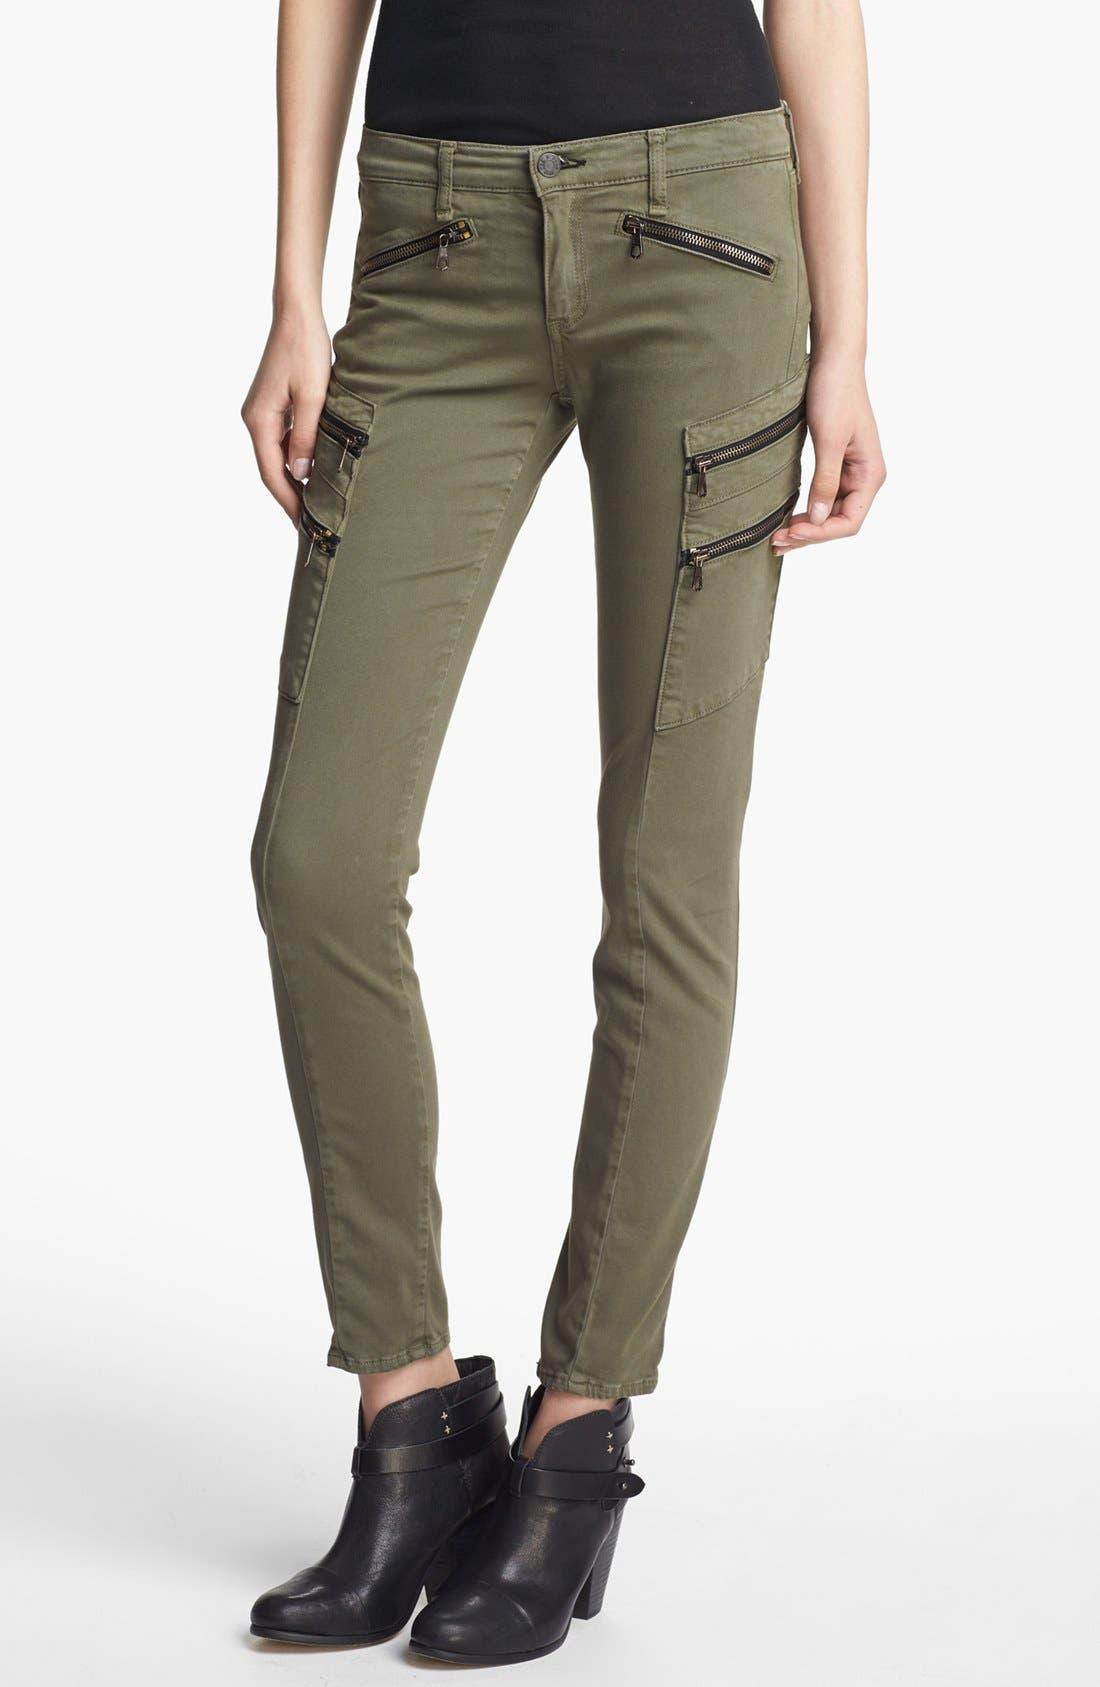 Main Image - rag & bone/JEAN 'Larit' Skinny Cargo Jeans